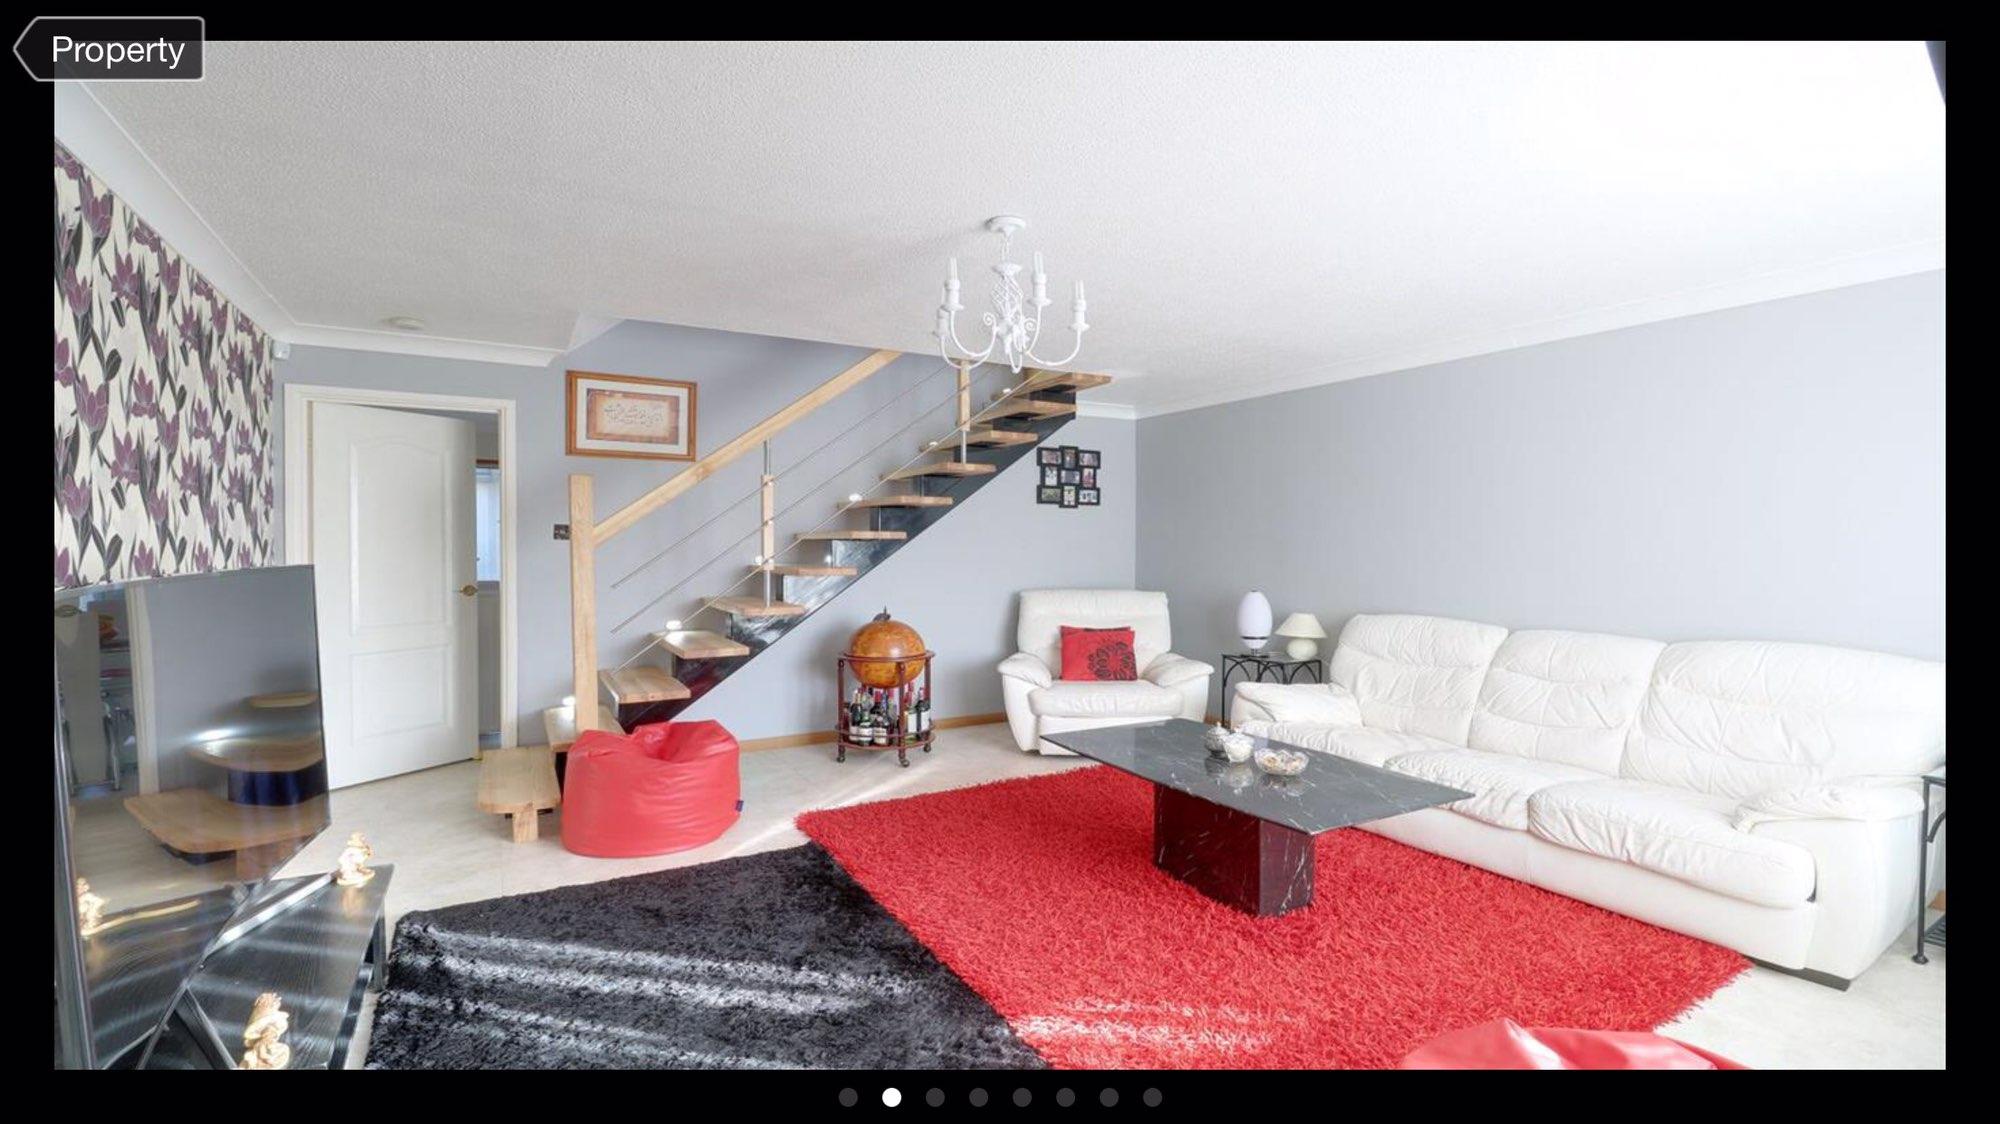 1 room in Milton Keynes, Milton Keynes, MK14 7DR RoomsLocal image